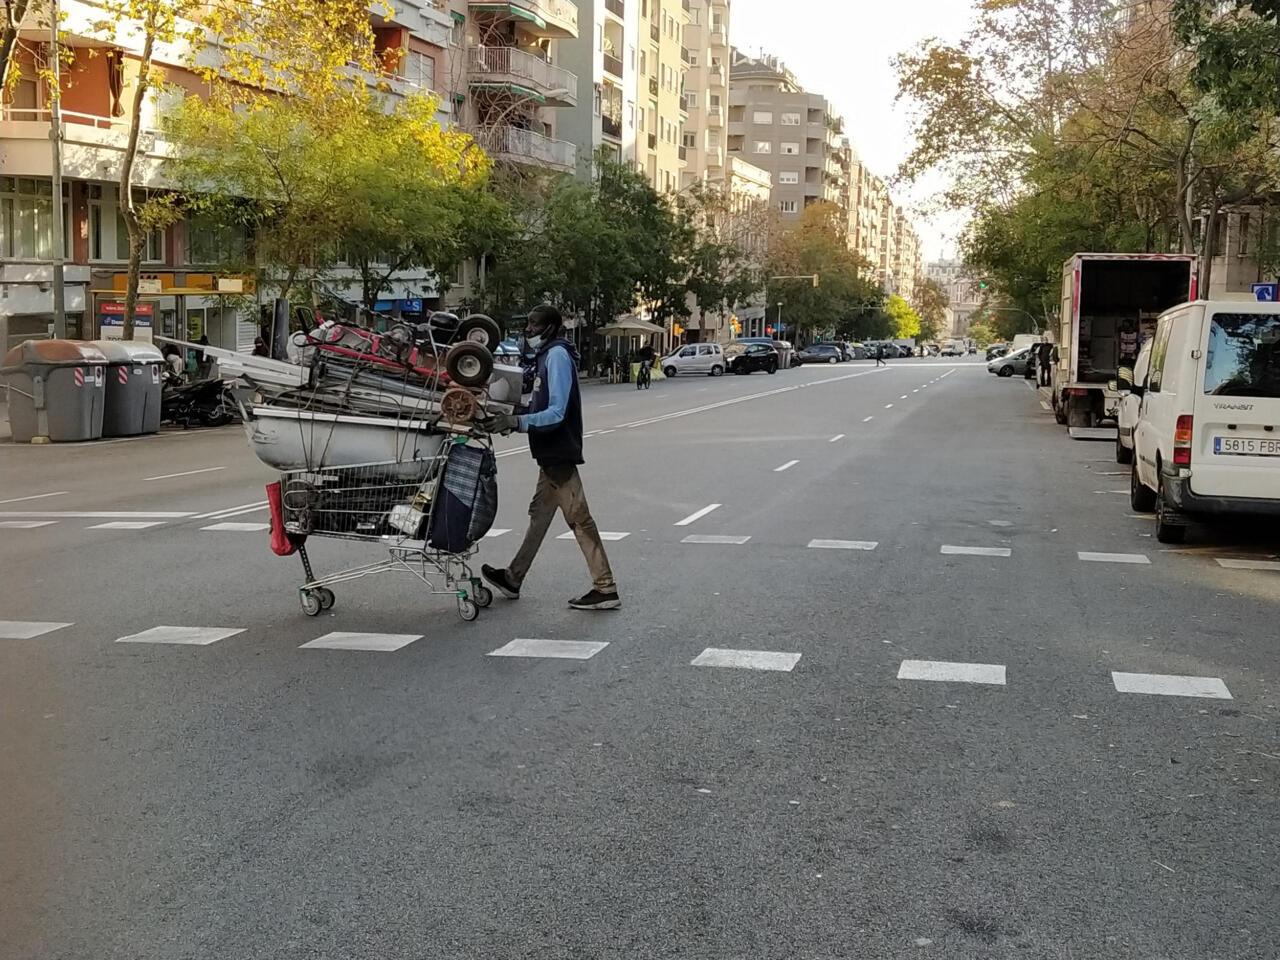 Migrantes Chatarreros En Barcelona La Cara Invisible Del Reciclaje 4 6